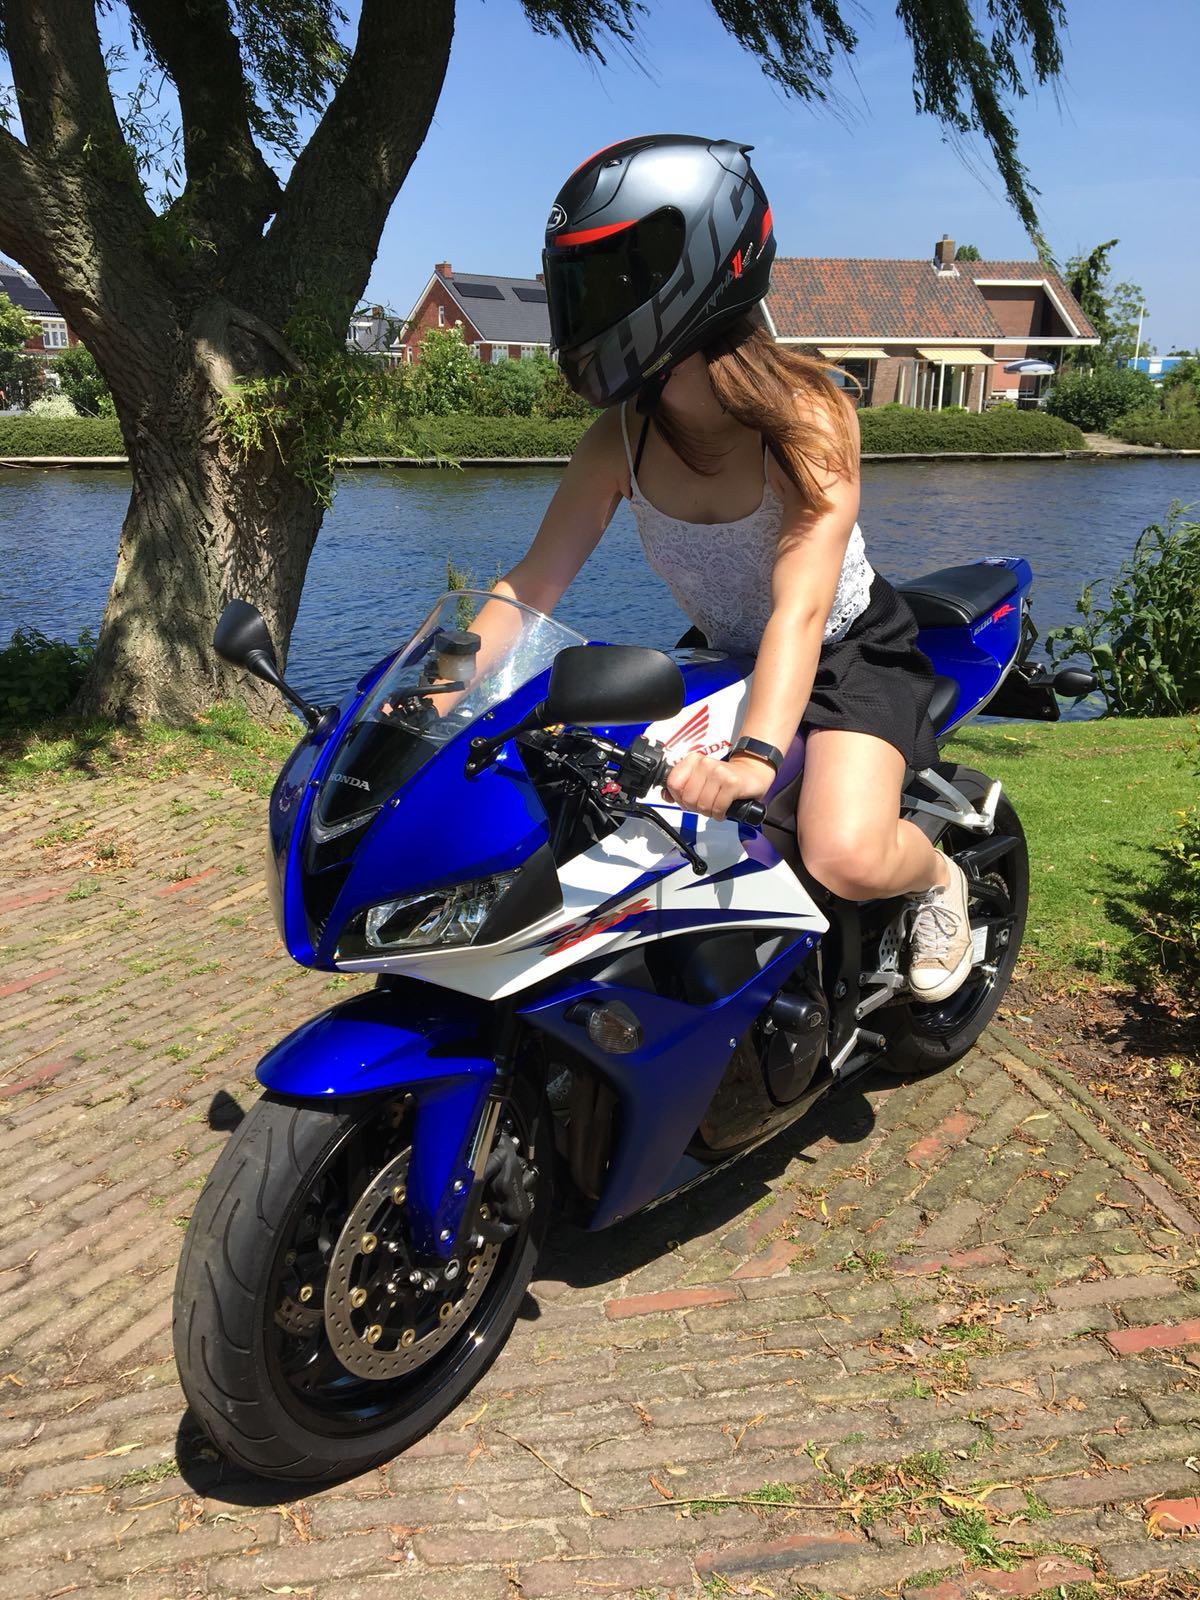 Motographicdesigns - Lifestyle image 3